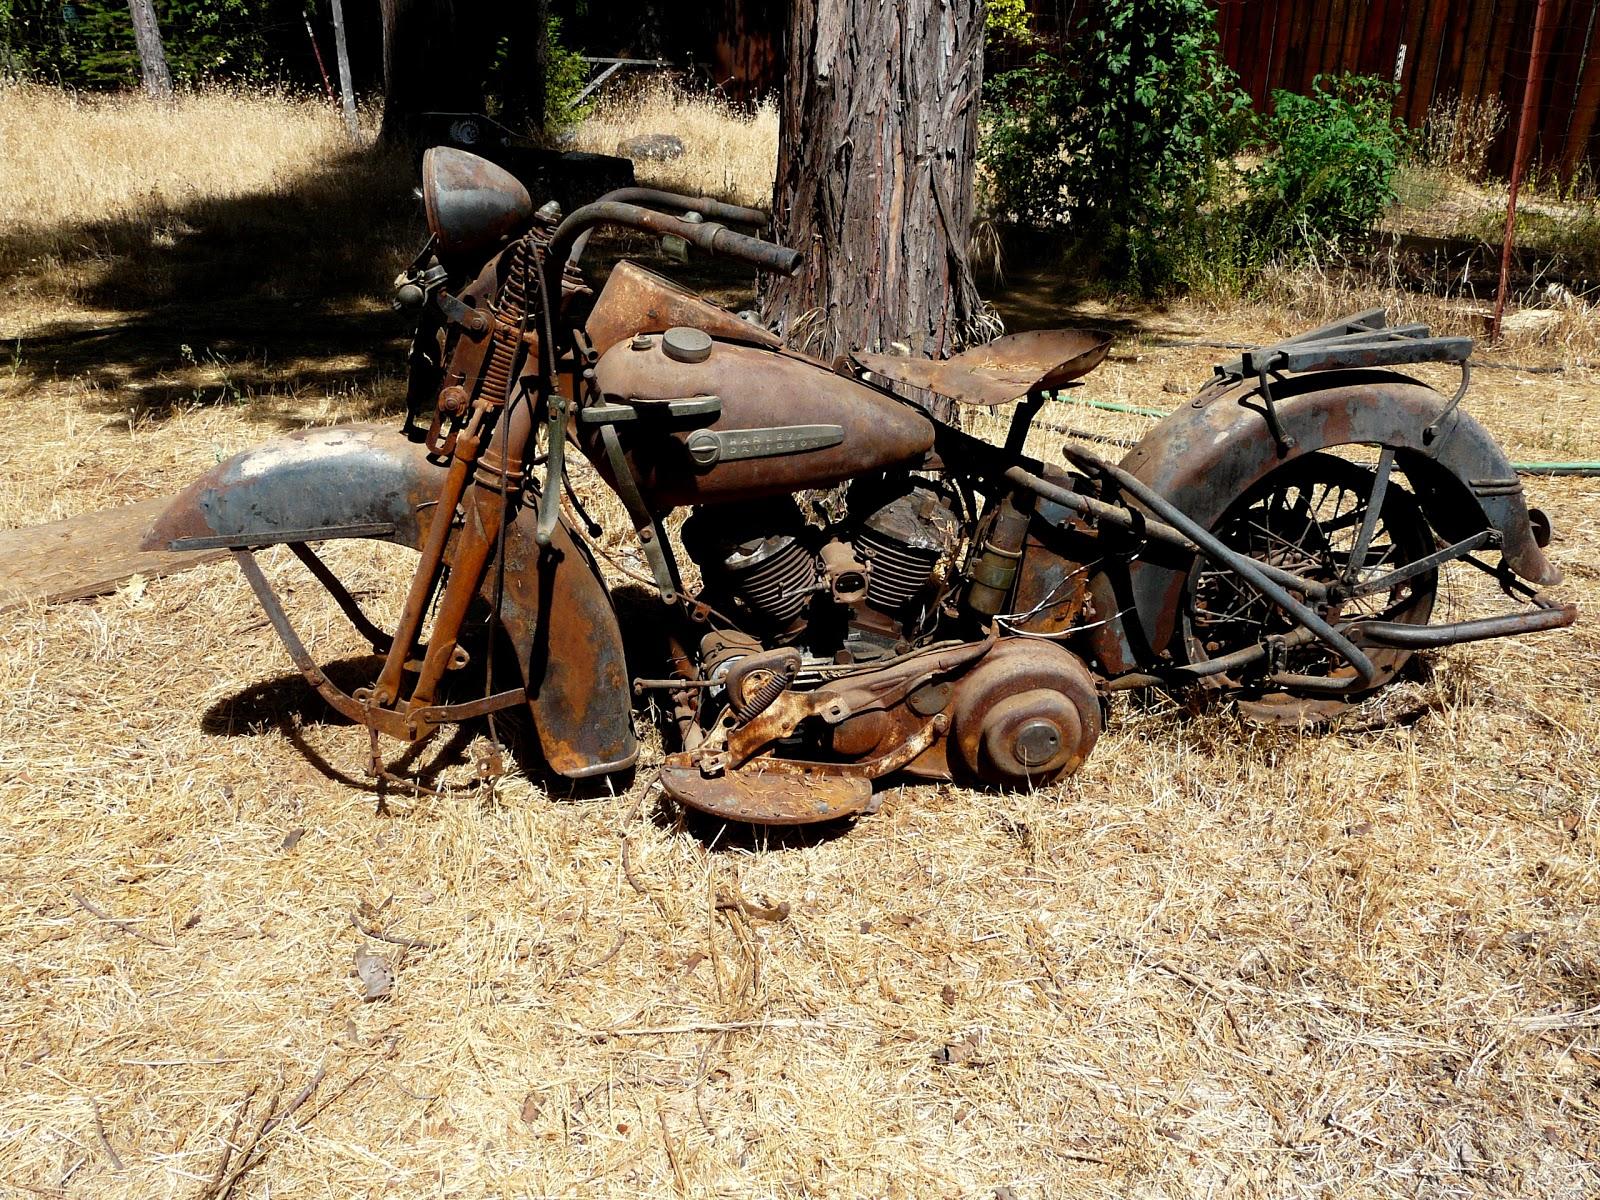 1951 flathead harley motorcyle - rusty yard art